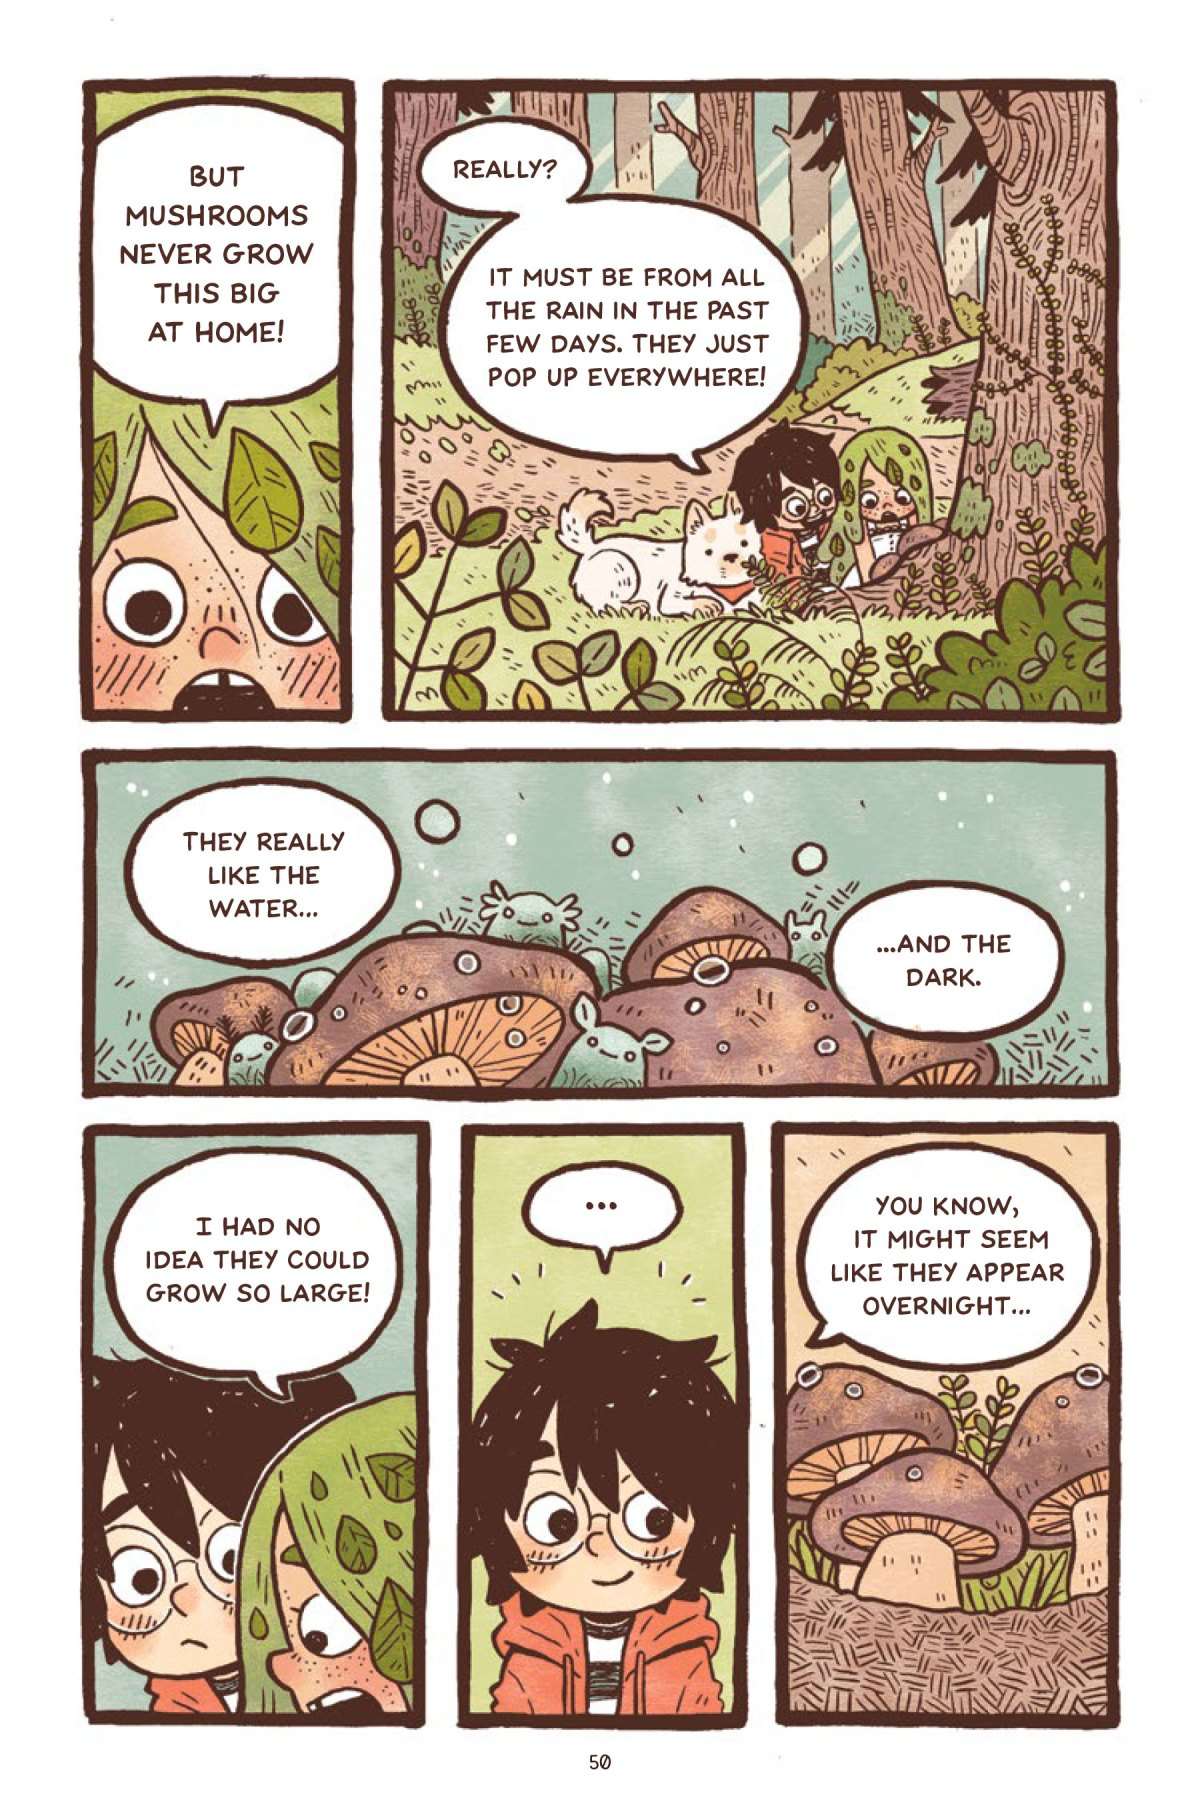 Mai K Nguyen's Pilu of the Woods